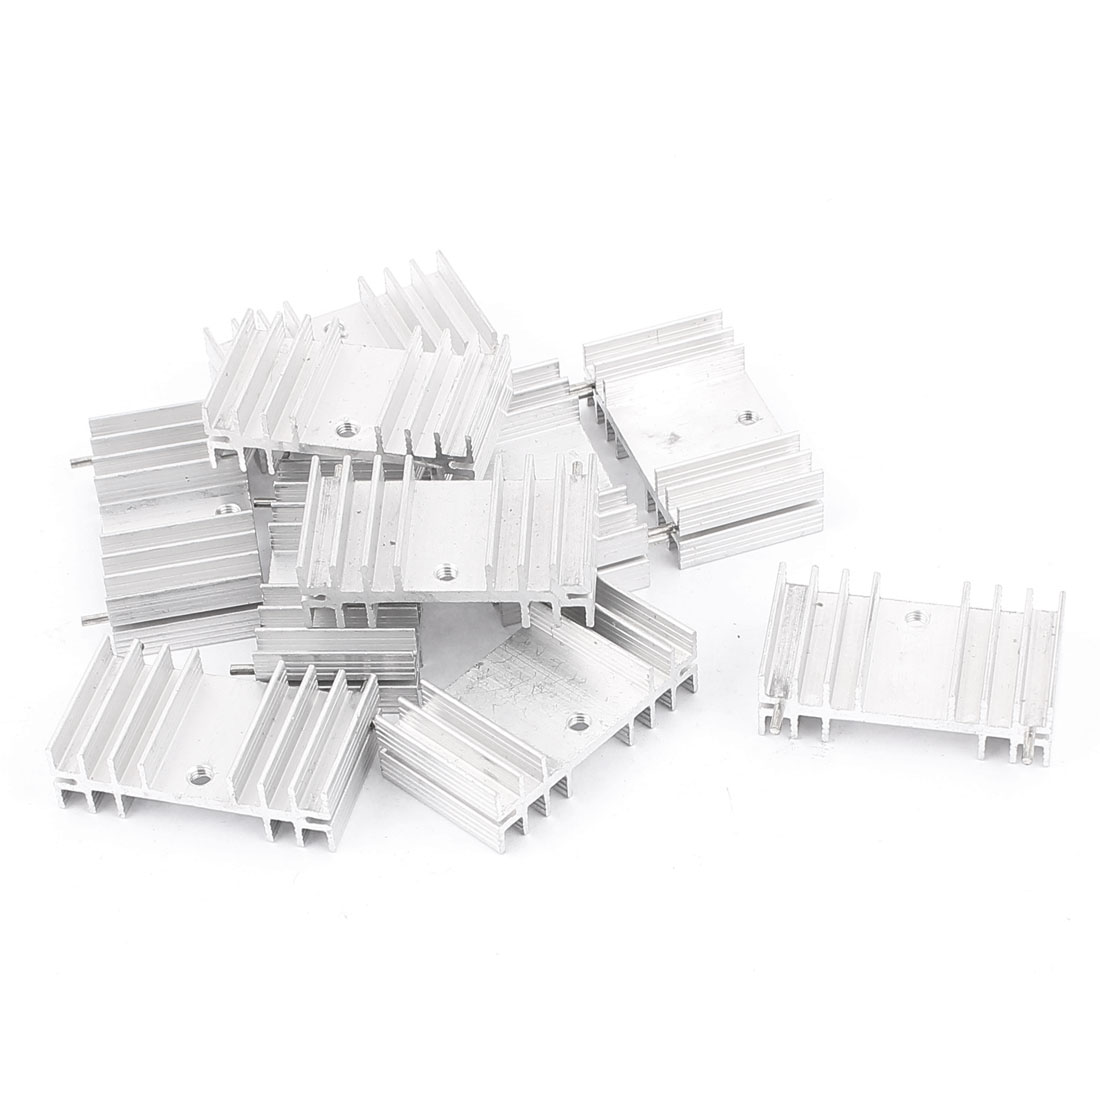 10 Pcs Aluminium 36 x 20 x 11mm Rectangle Heatsink Cooling Cooler Fin